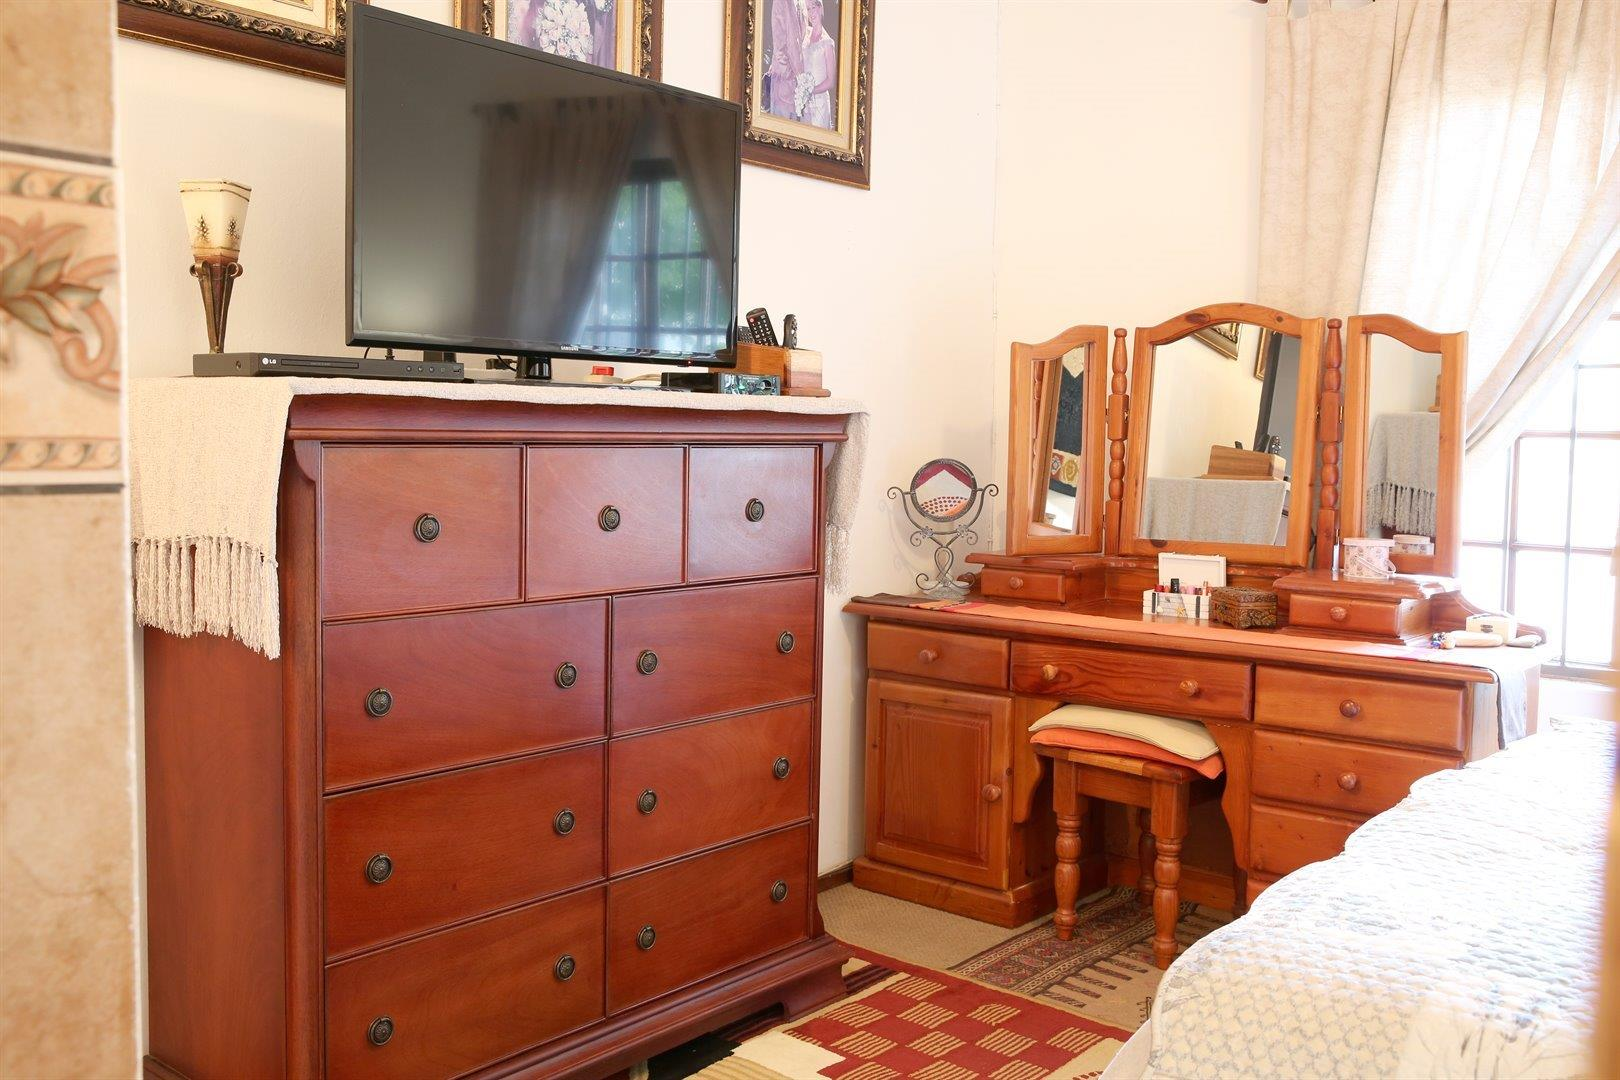 Rietvalleirand property for sale. Ref No: 13545797. Picture no 6